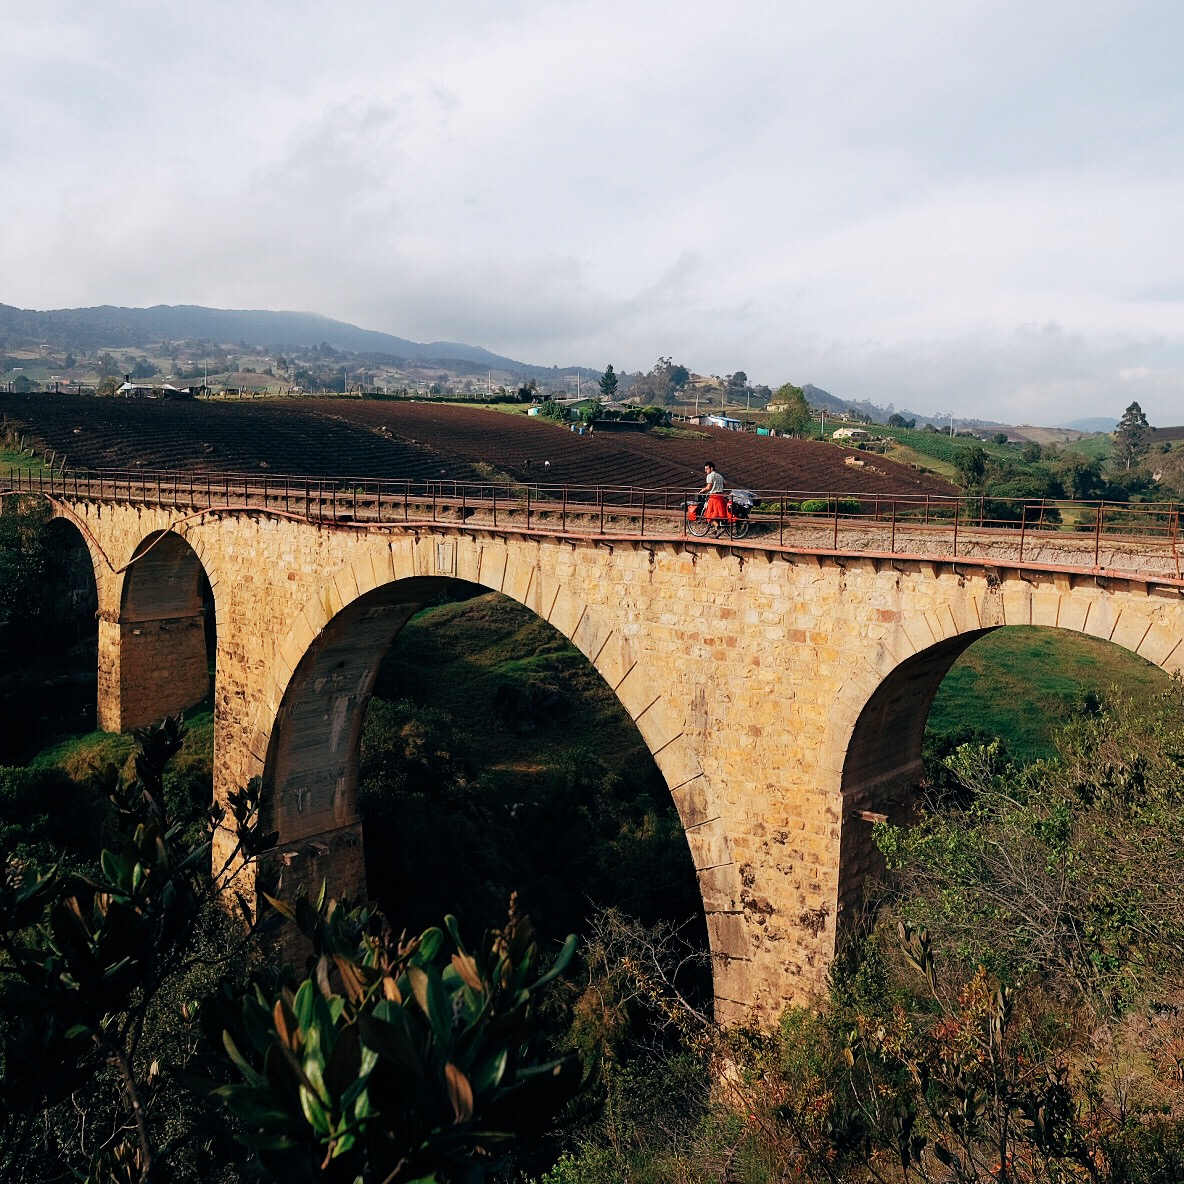 Crossing this beautiful, old railway bridge on our way to  Samaca  town, a few kilometers away from  Villa de Leyva .